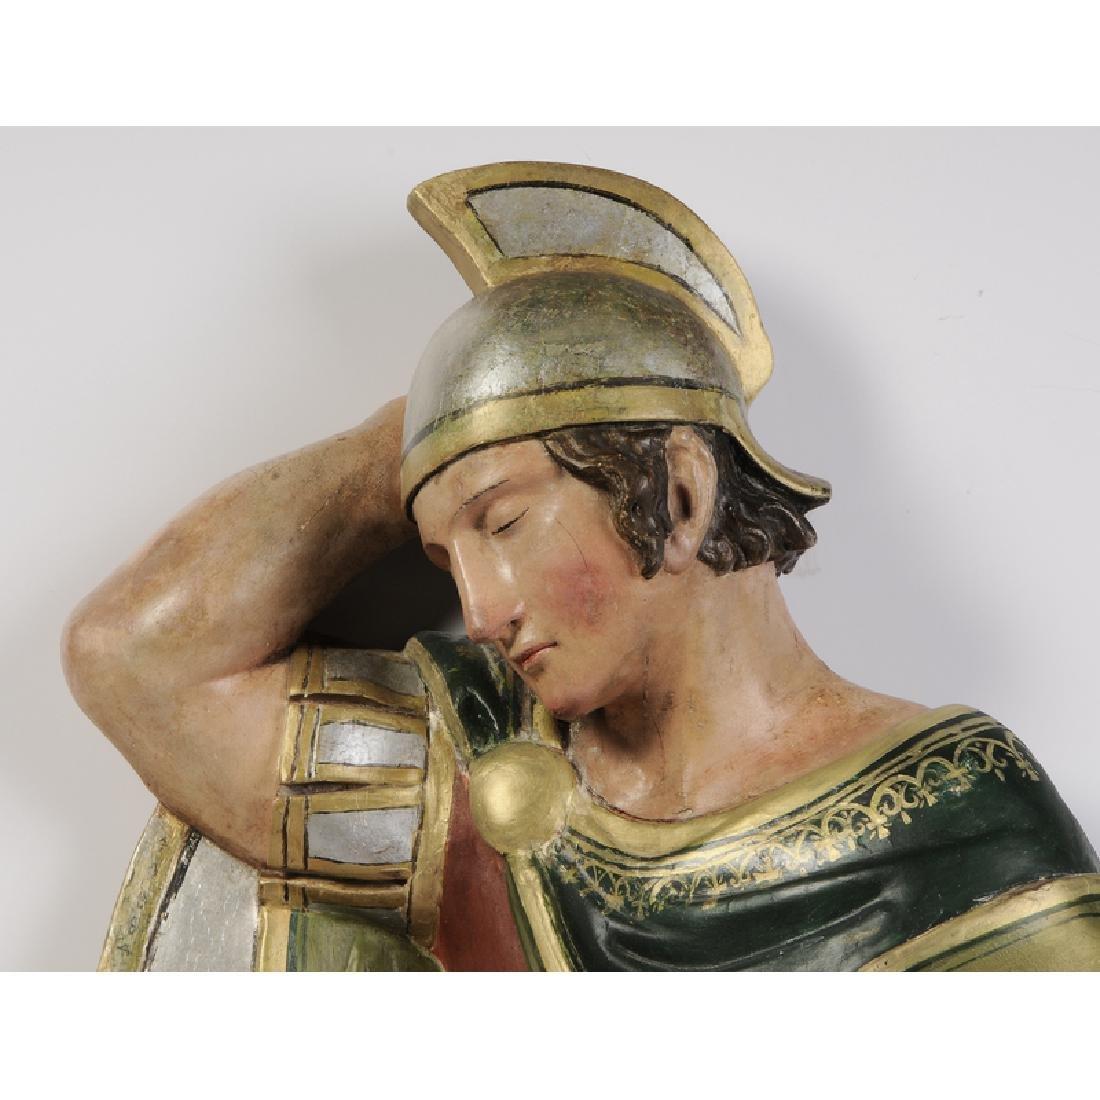 Wood Sculpture Sleeping Roman Soldier - 2